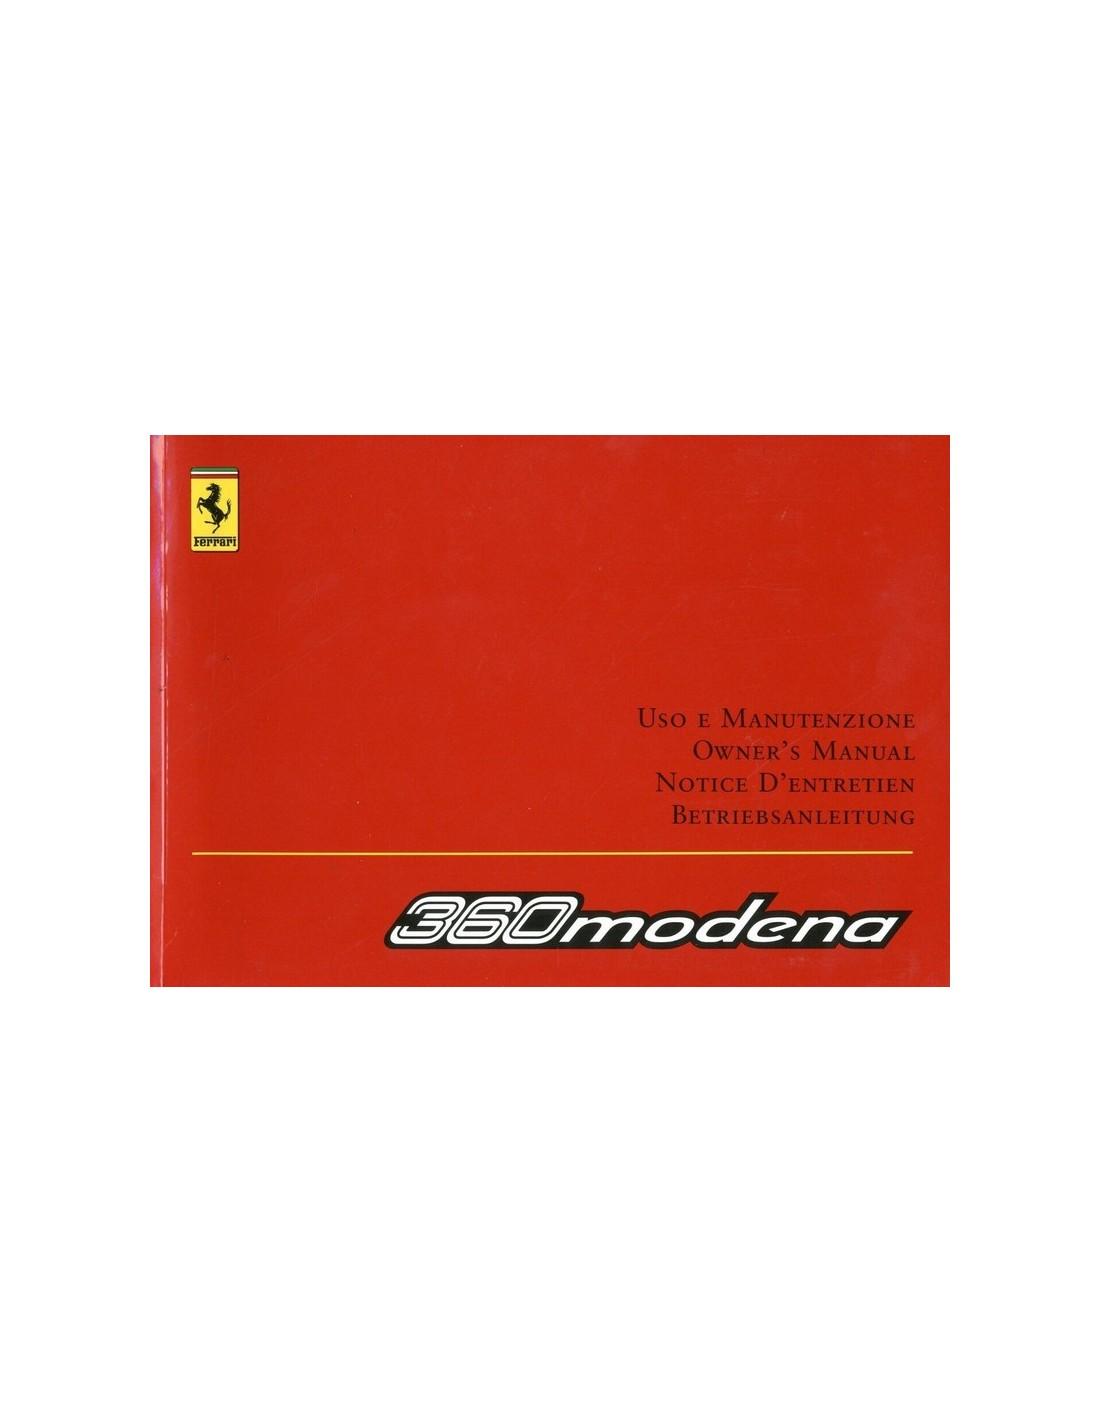 Ferrari Repair Manuals: 2002 FERRARI 360 MODENA OWNERS MANUAL 1770/02